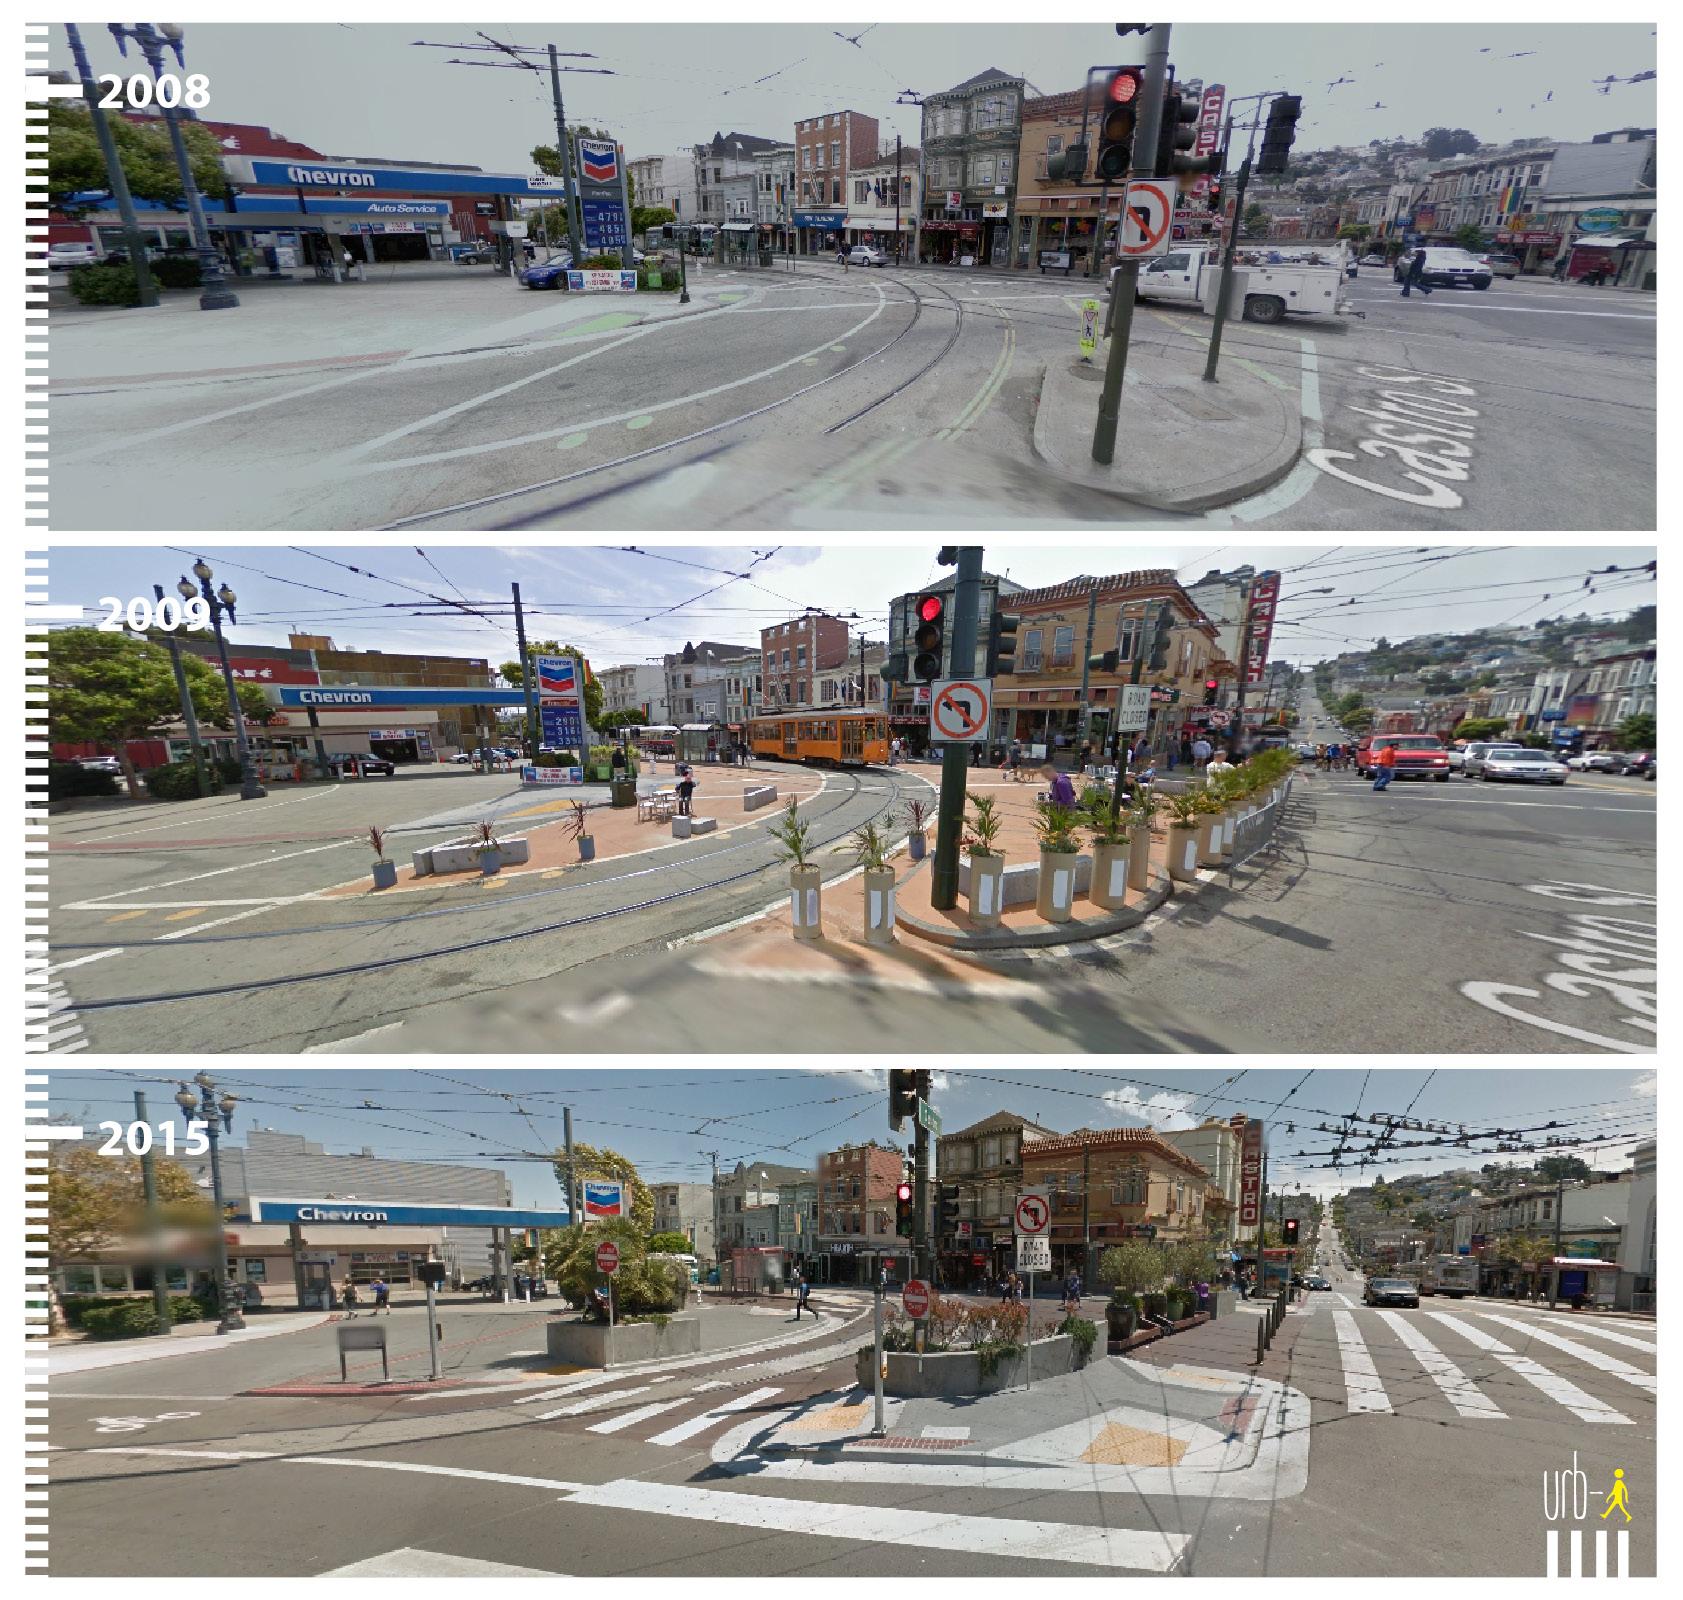 0618 US San Francisco, Castro st - Market st